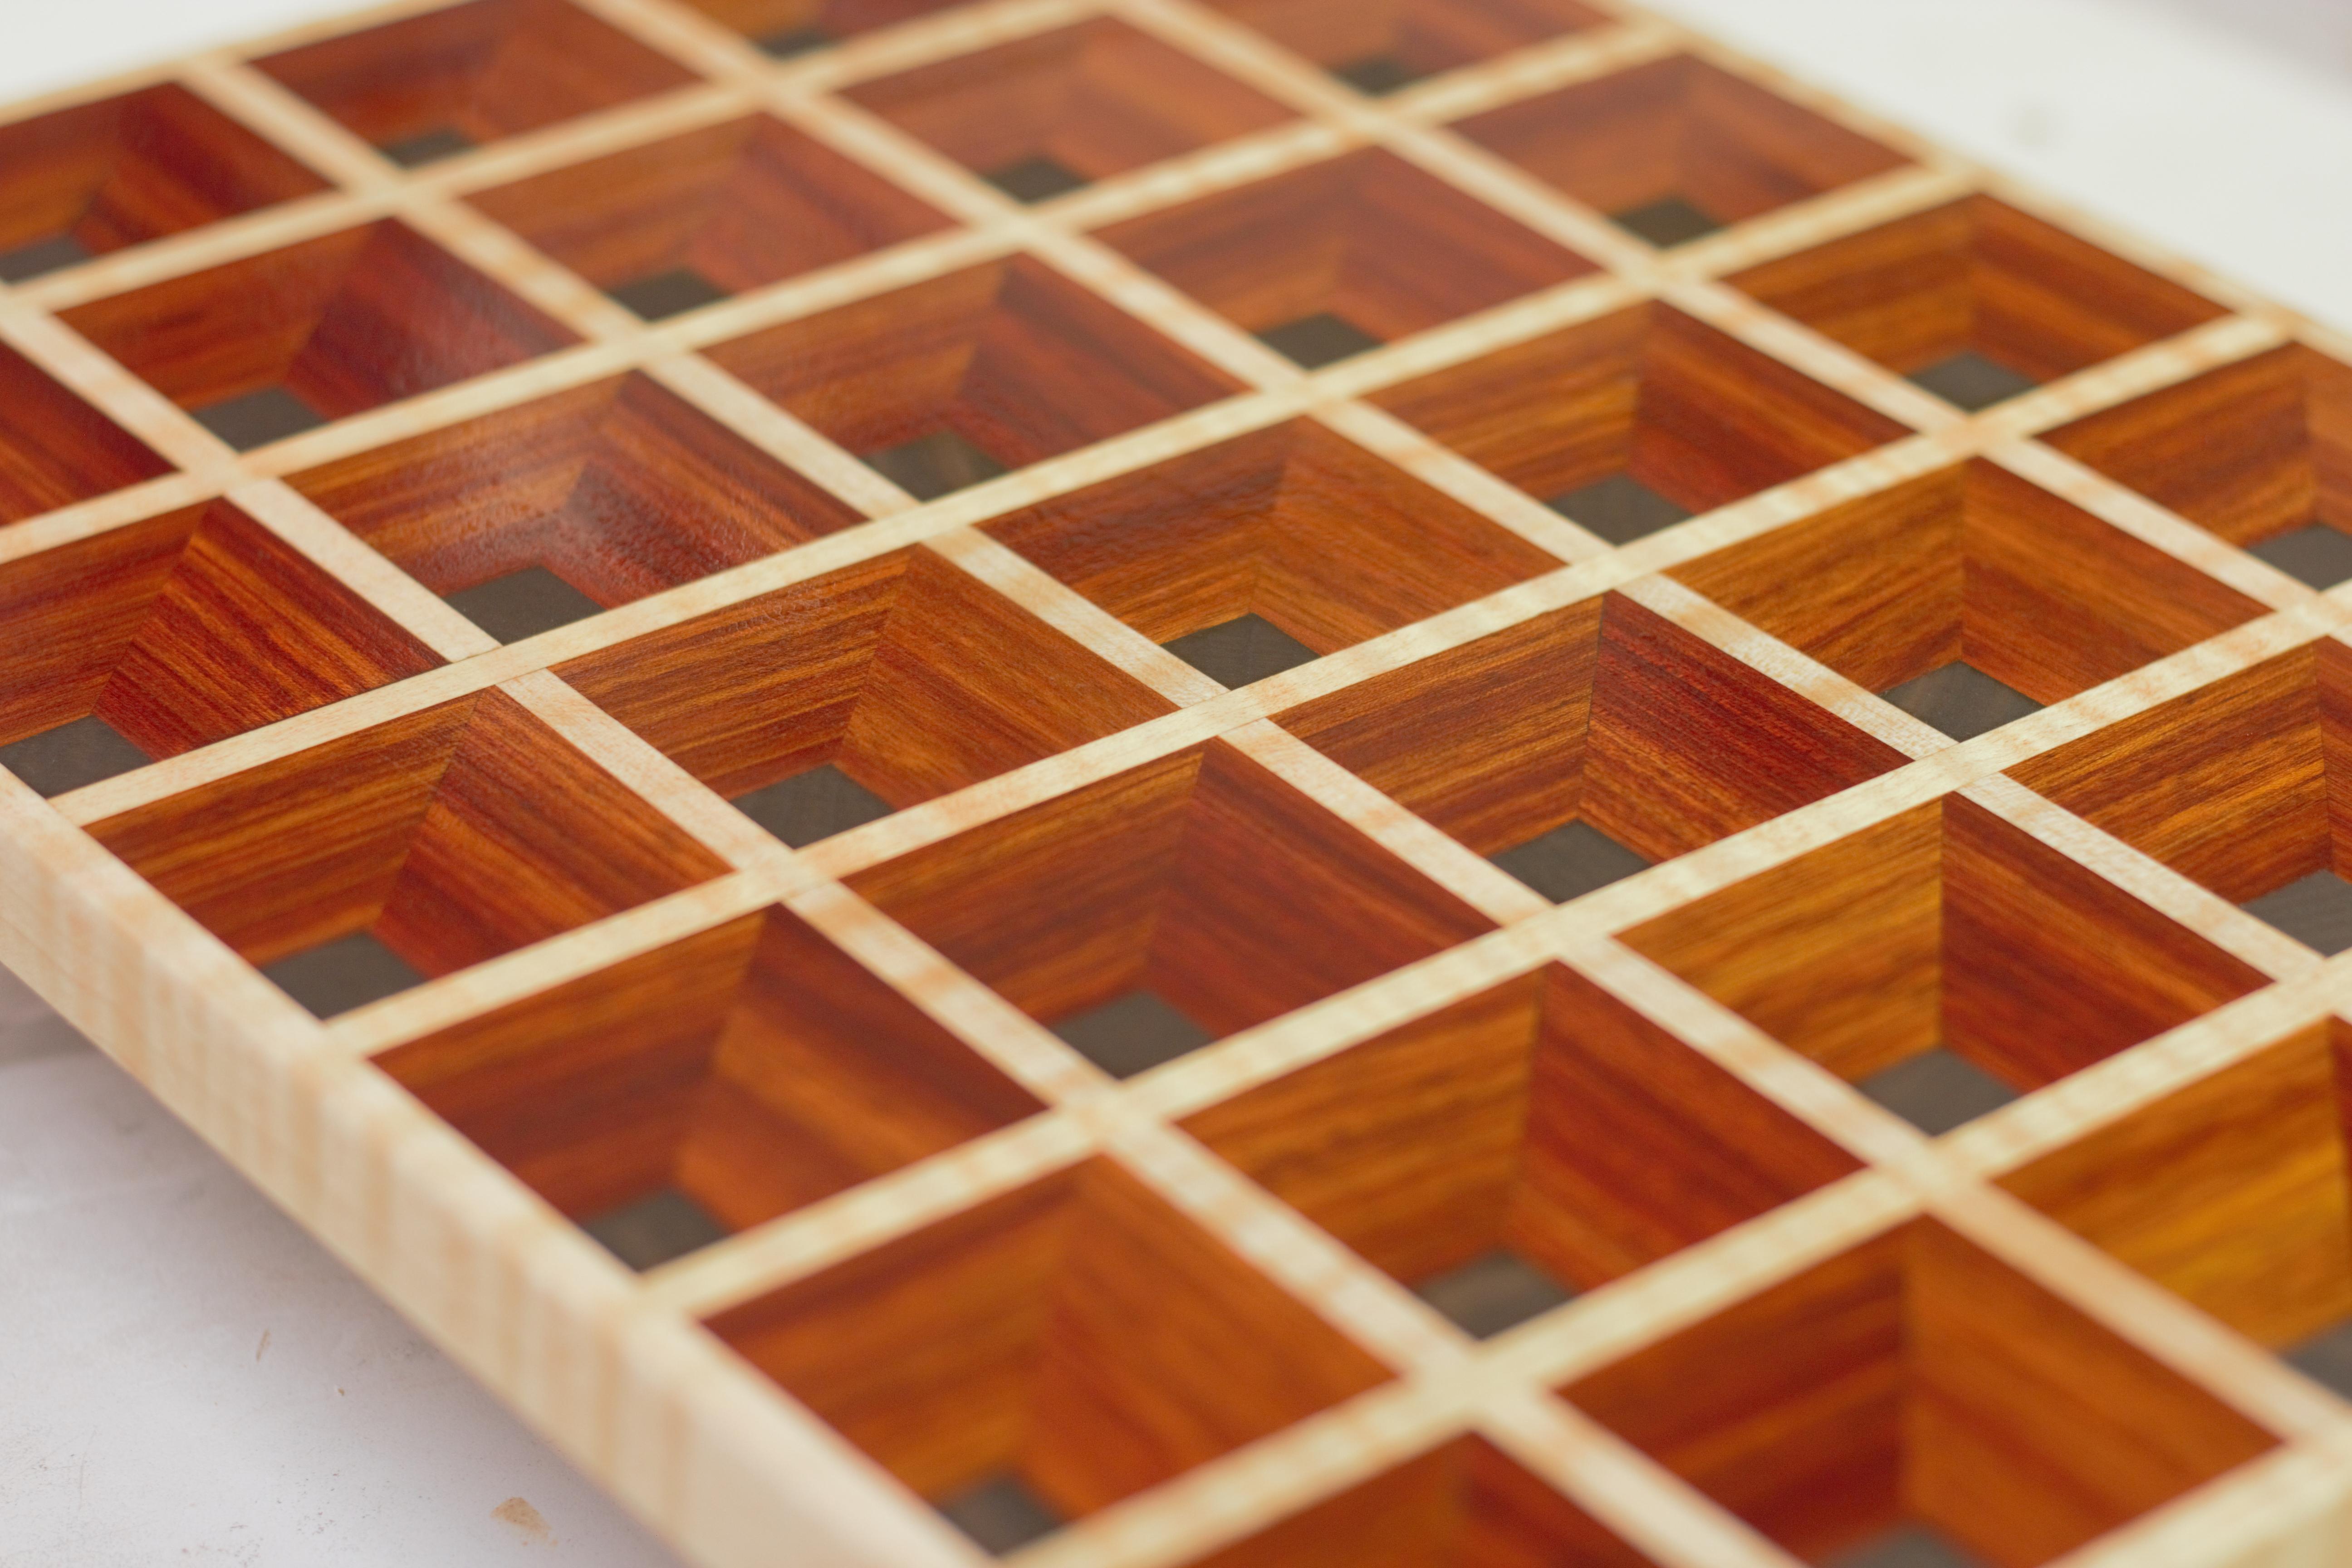 The Waffle Board